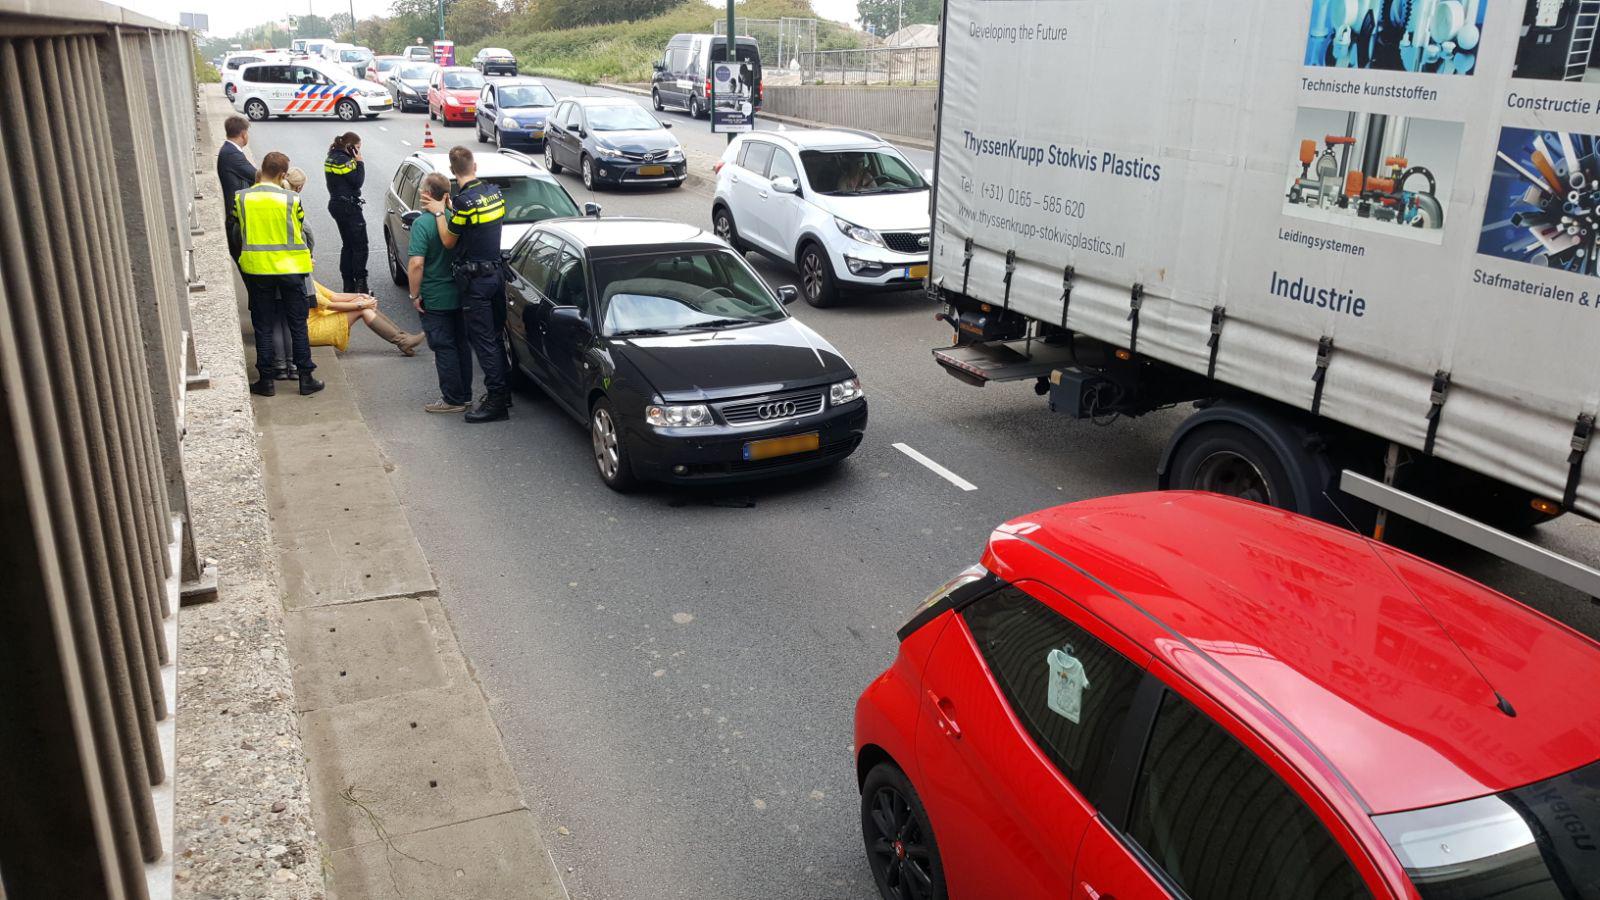 Kop-staartbotsing met drie auto's op Hollandbaan